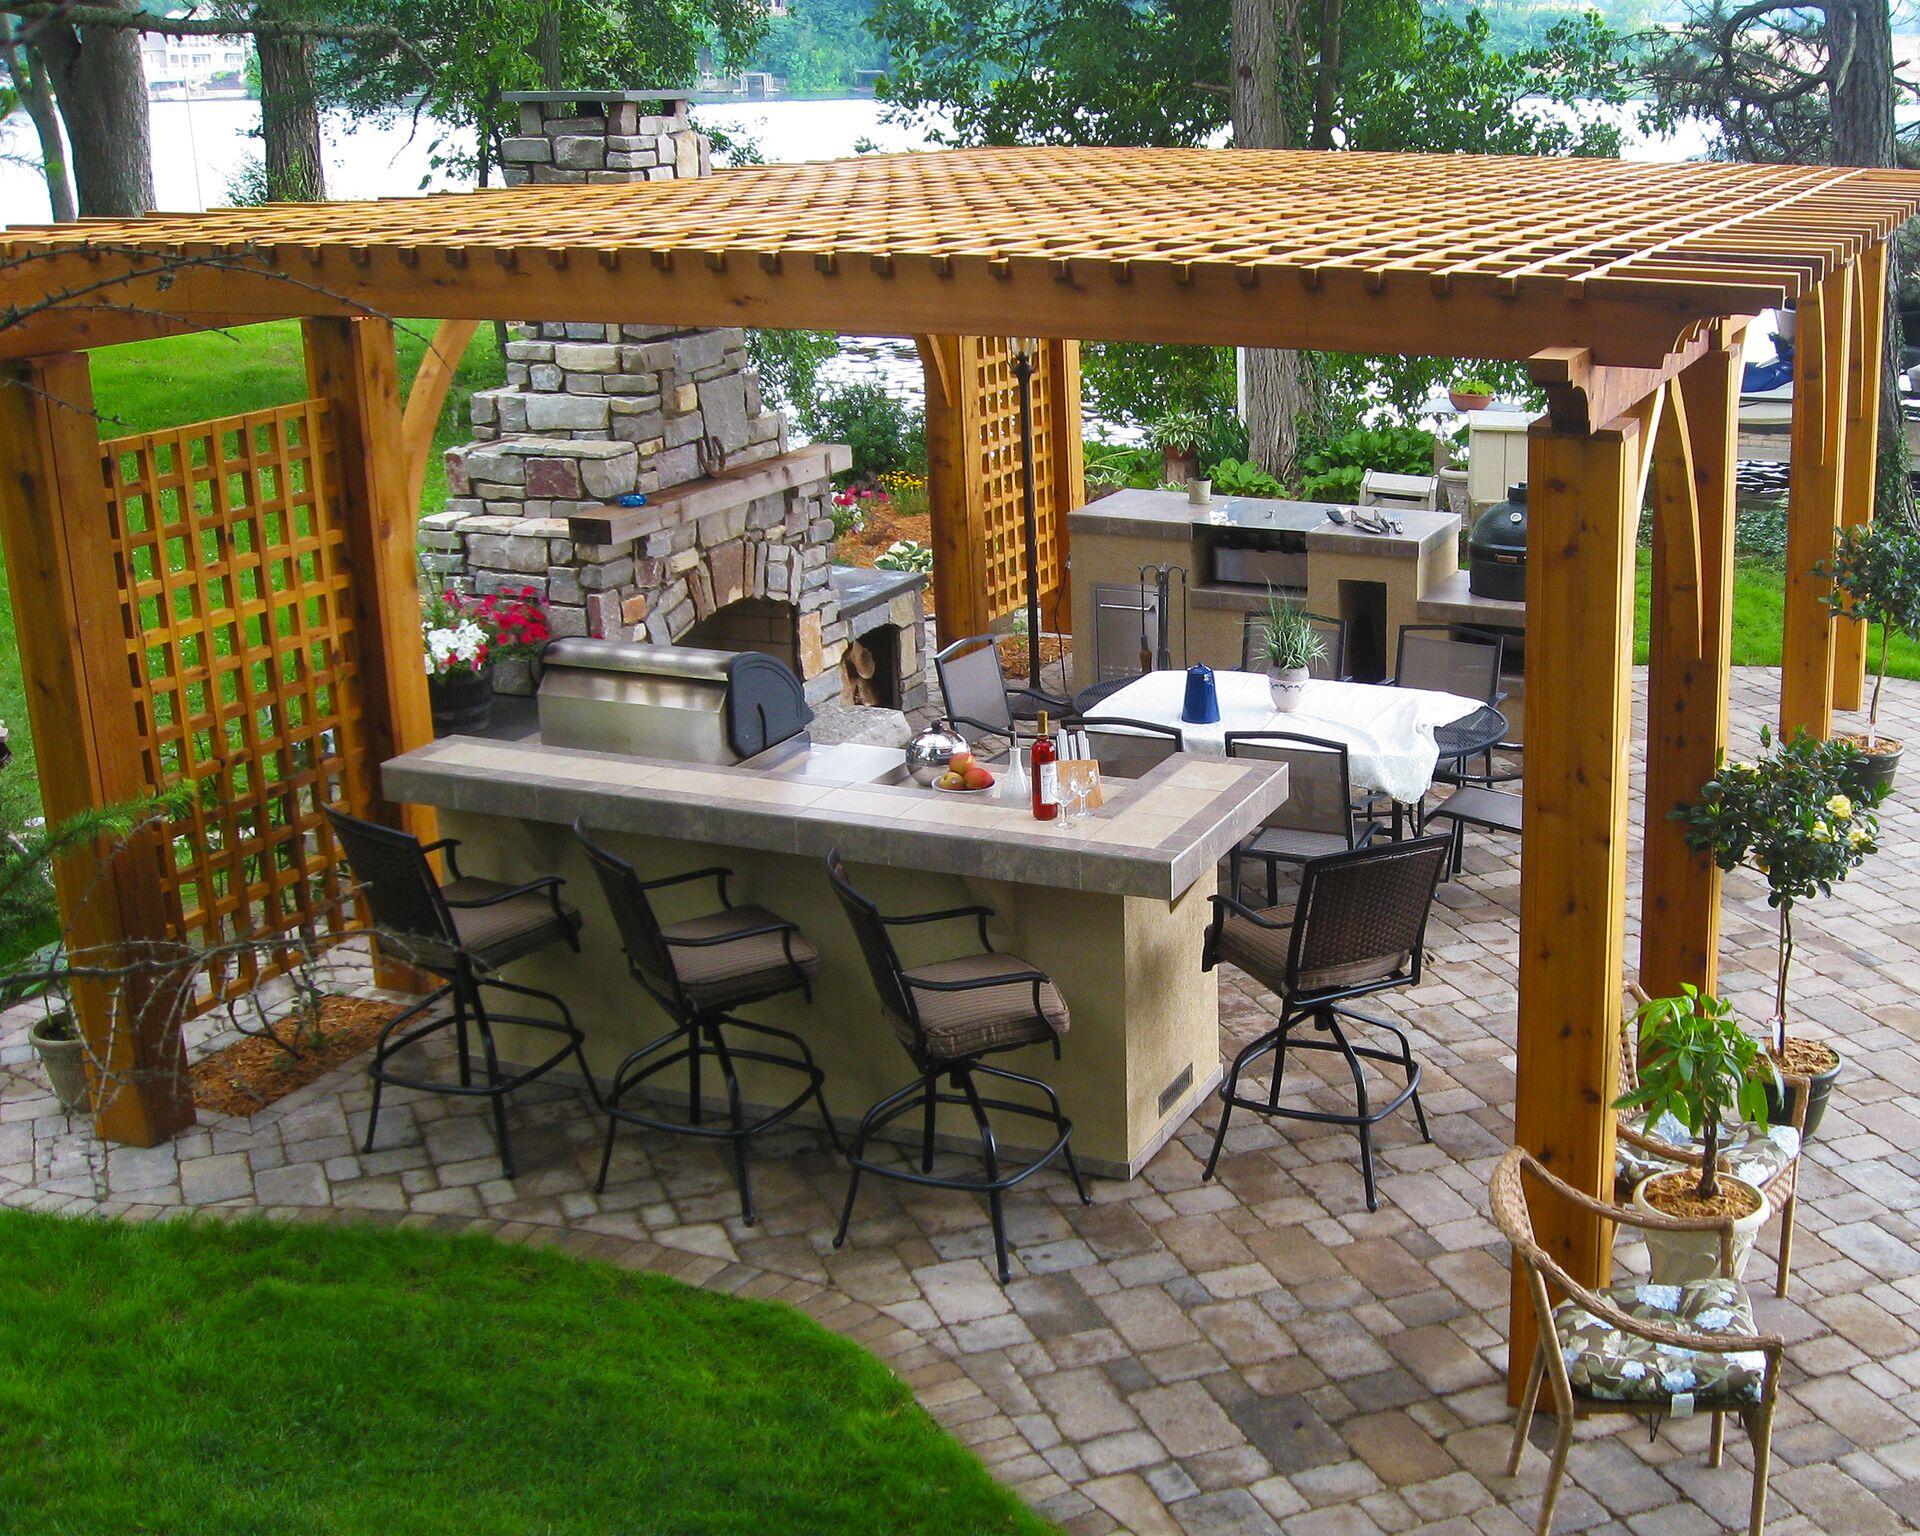 pergola outdoor room kitchen fireplace outdoor space paver hardscape planting landscape design lakefront